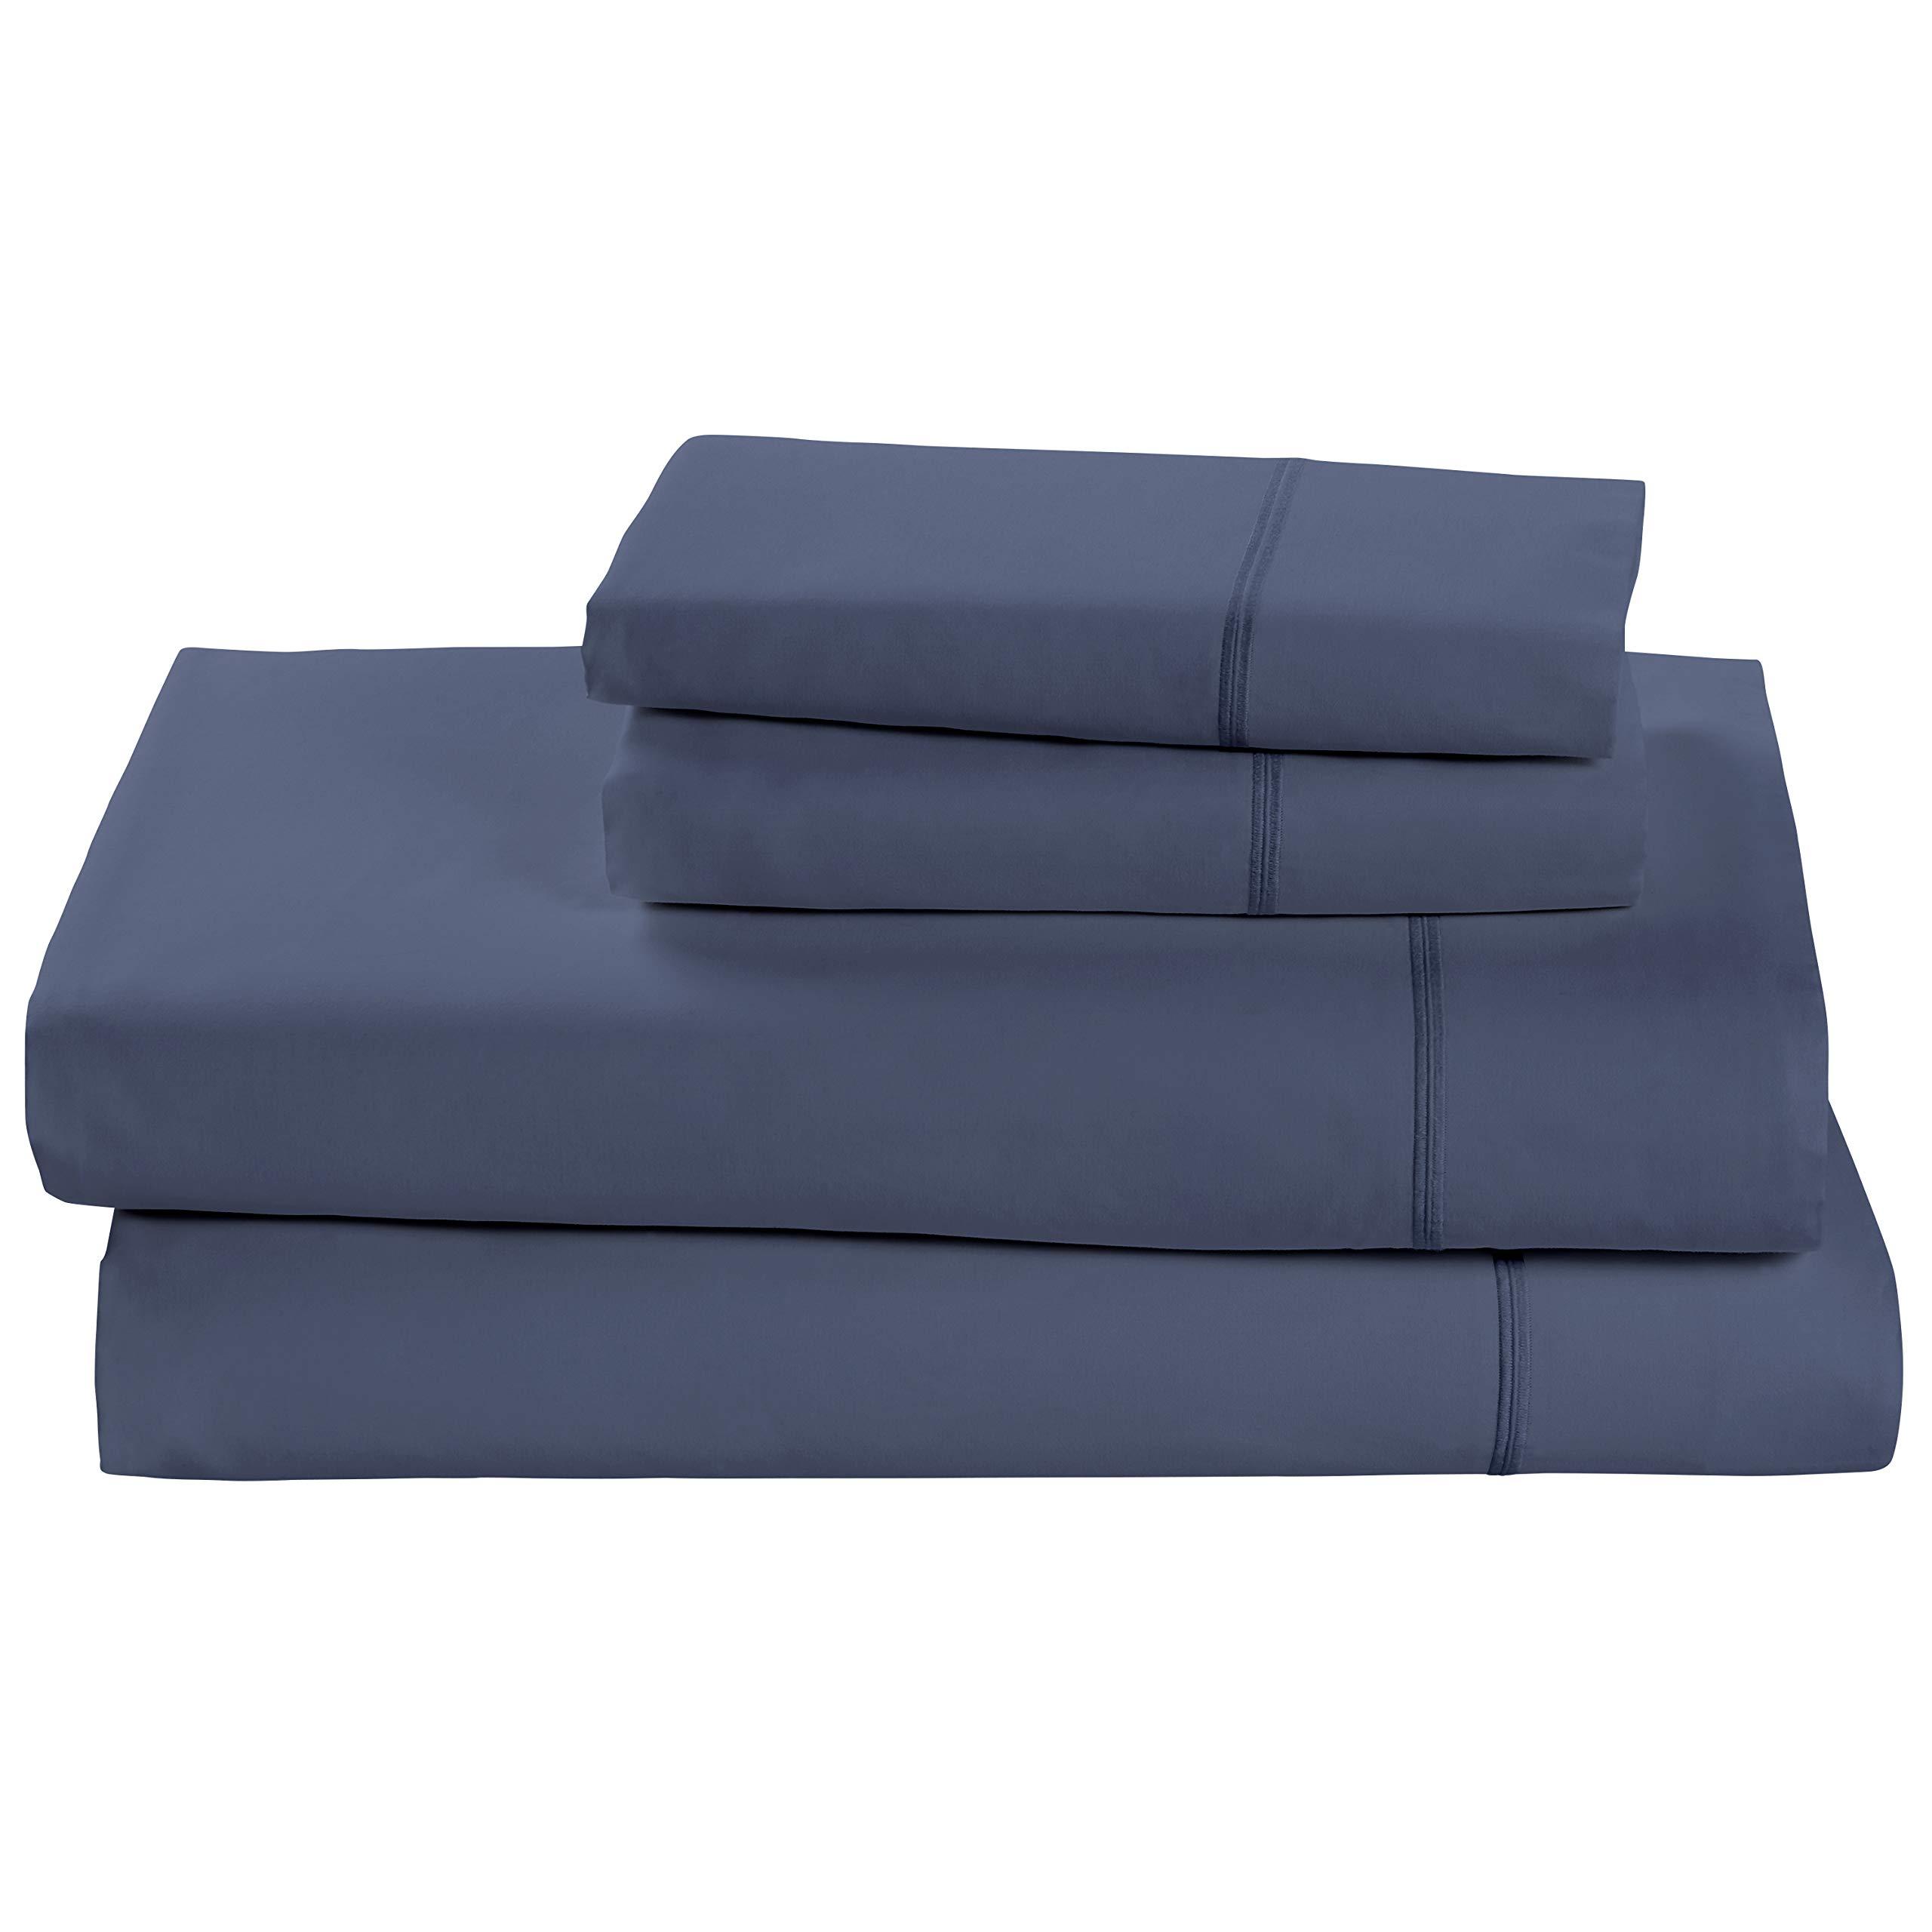 Rivet Soft 100% Percale Cotton Bed Sheet Set, Easy Care, Queen, Denim Blue